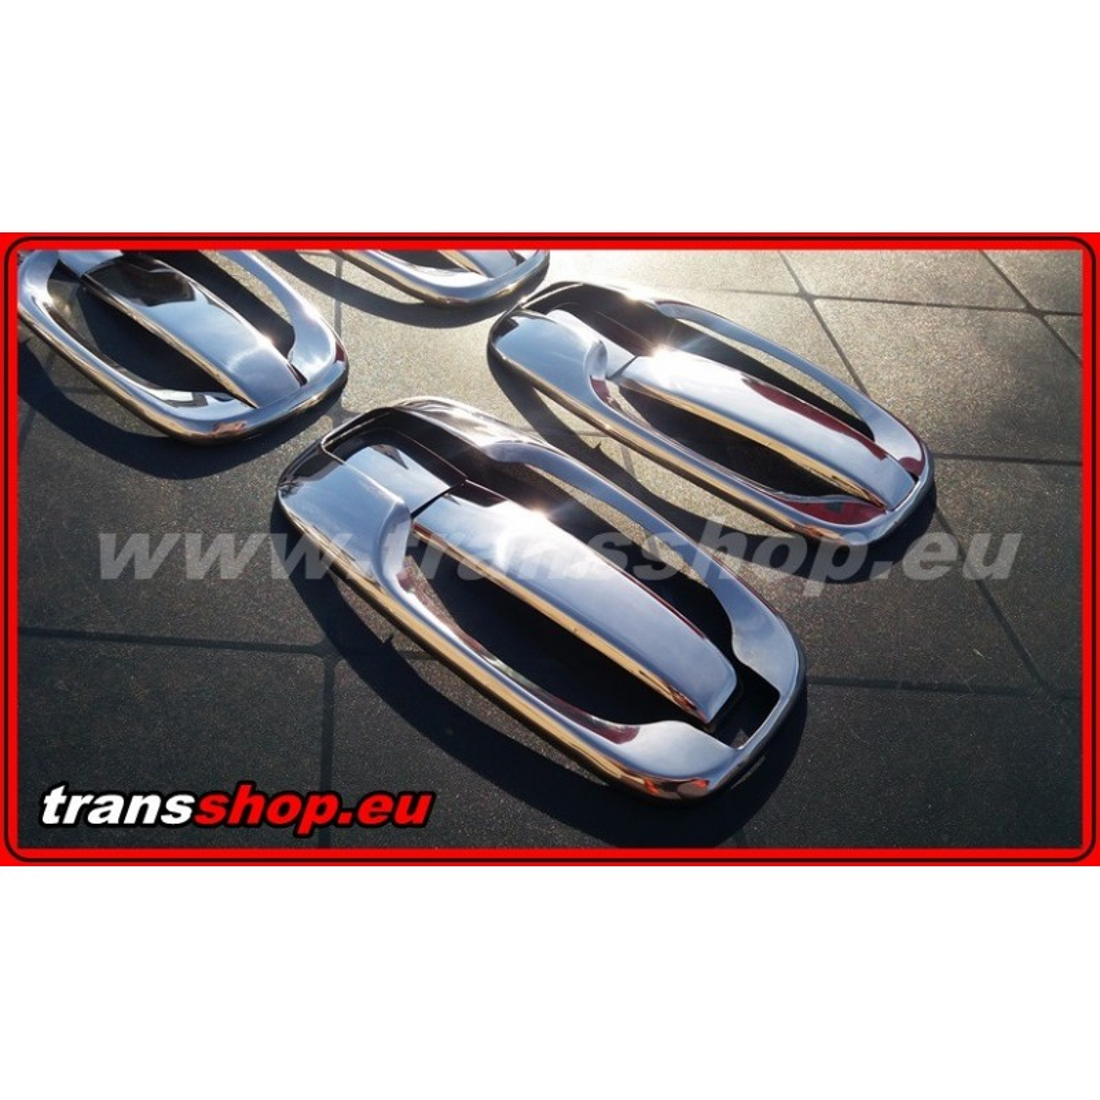 VIVARO TRAFIC door handle cover inox chrome 3D - TRANSSHOP